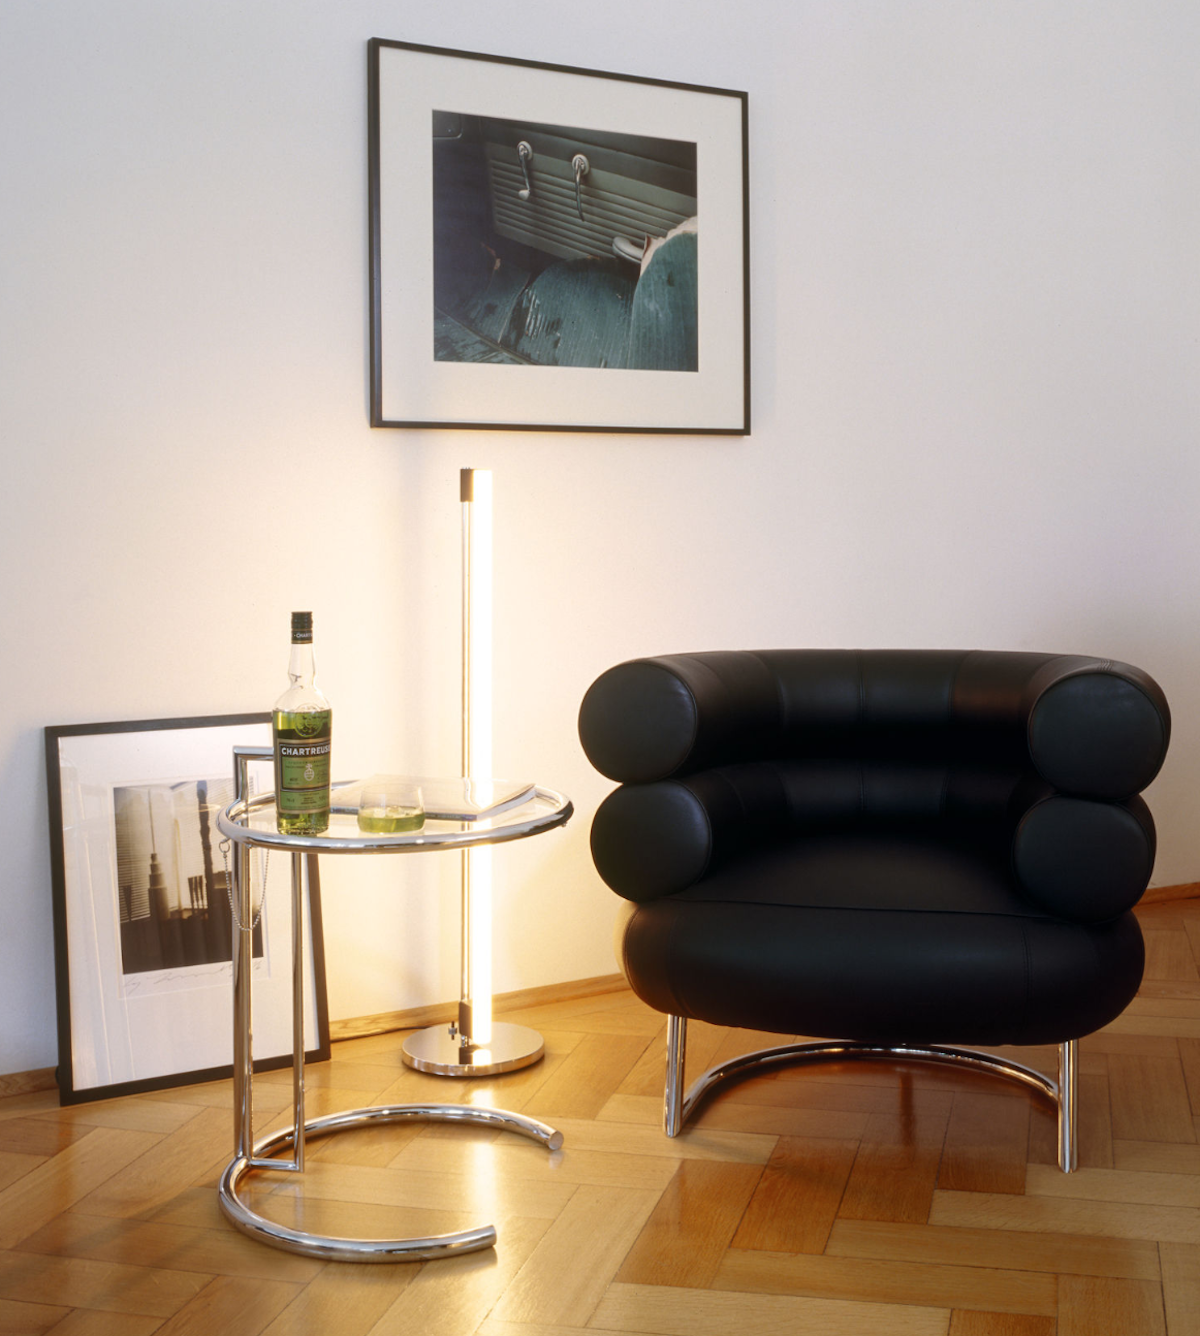 fauteuil bibendum eileen gray cuir noir table basse E1027 - blog déco - clemaroundthecorner